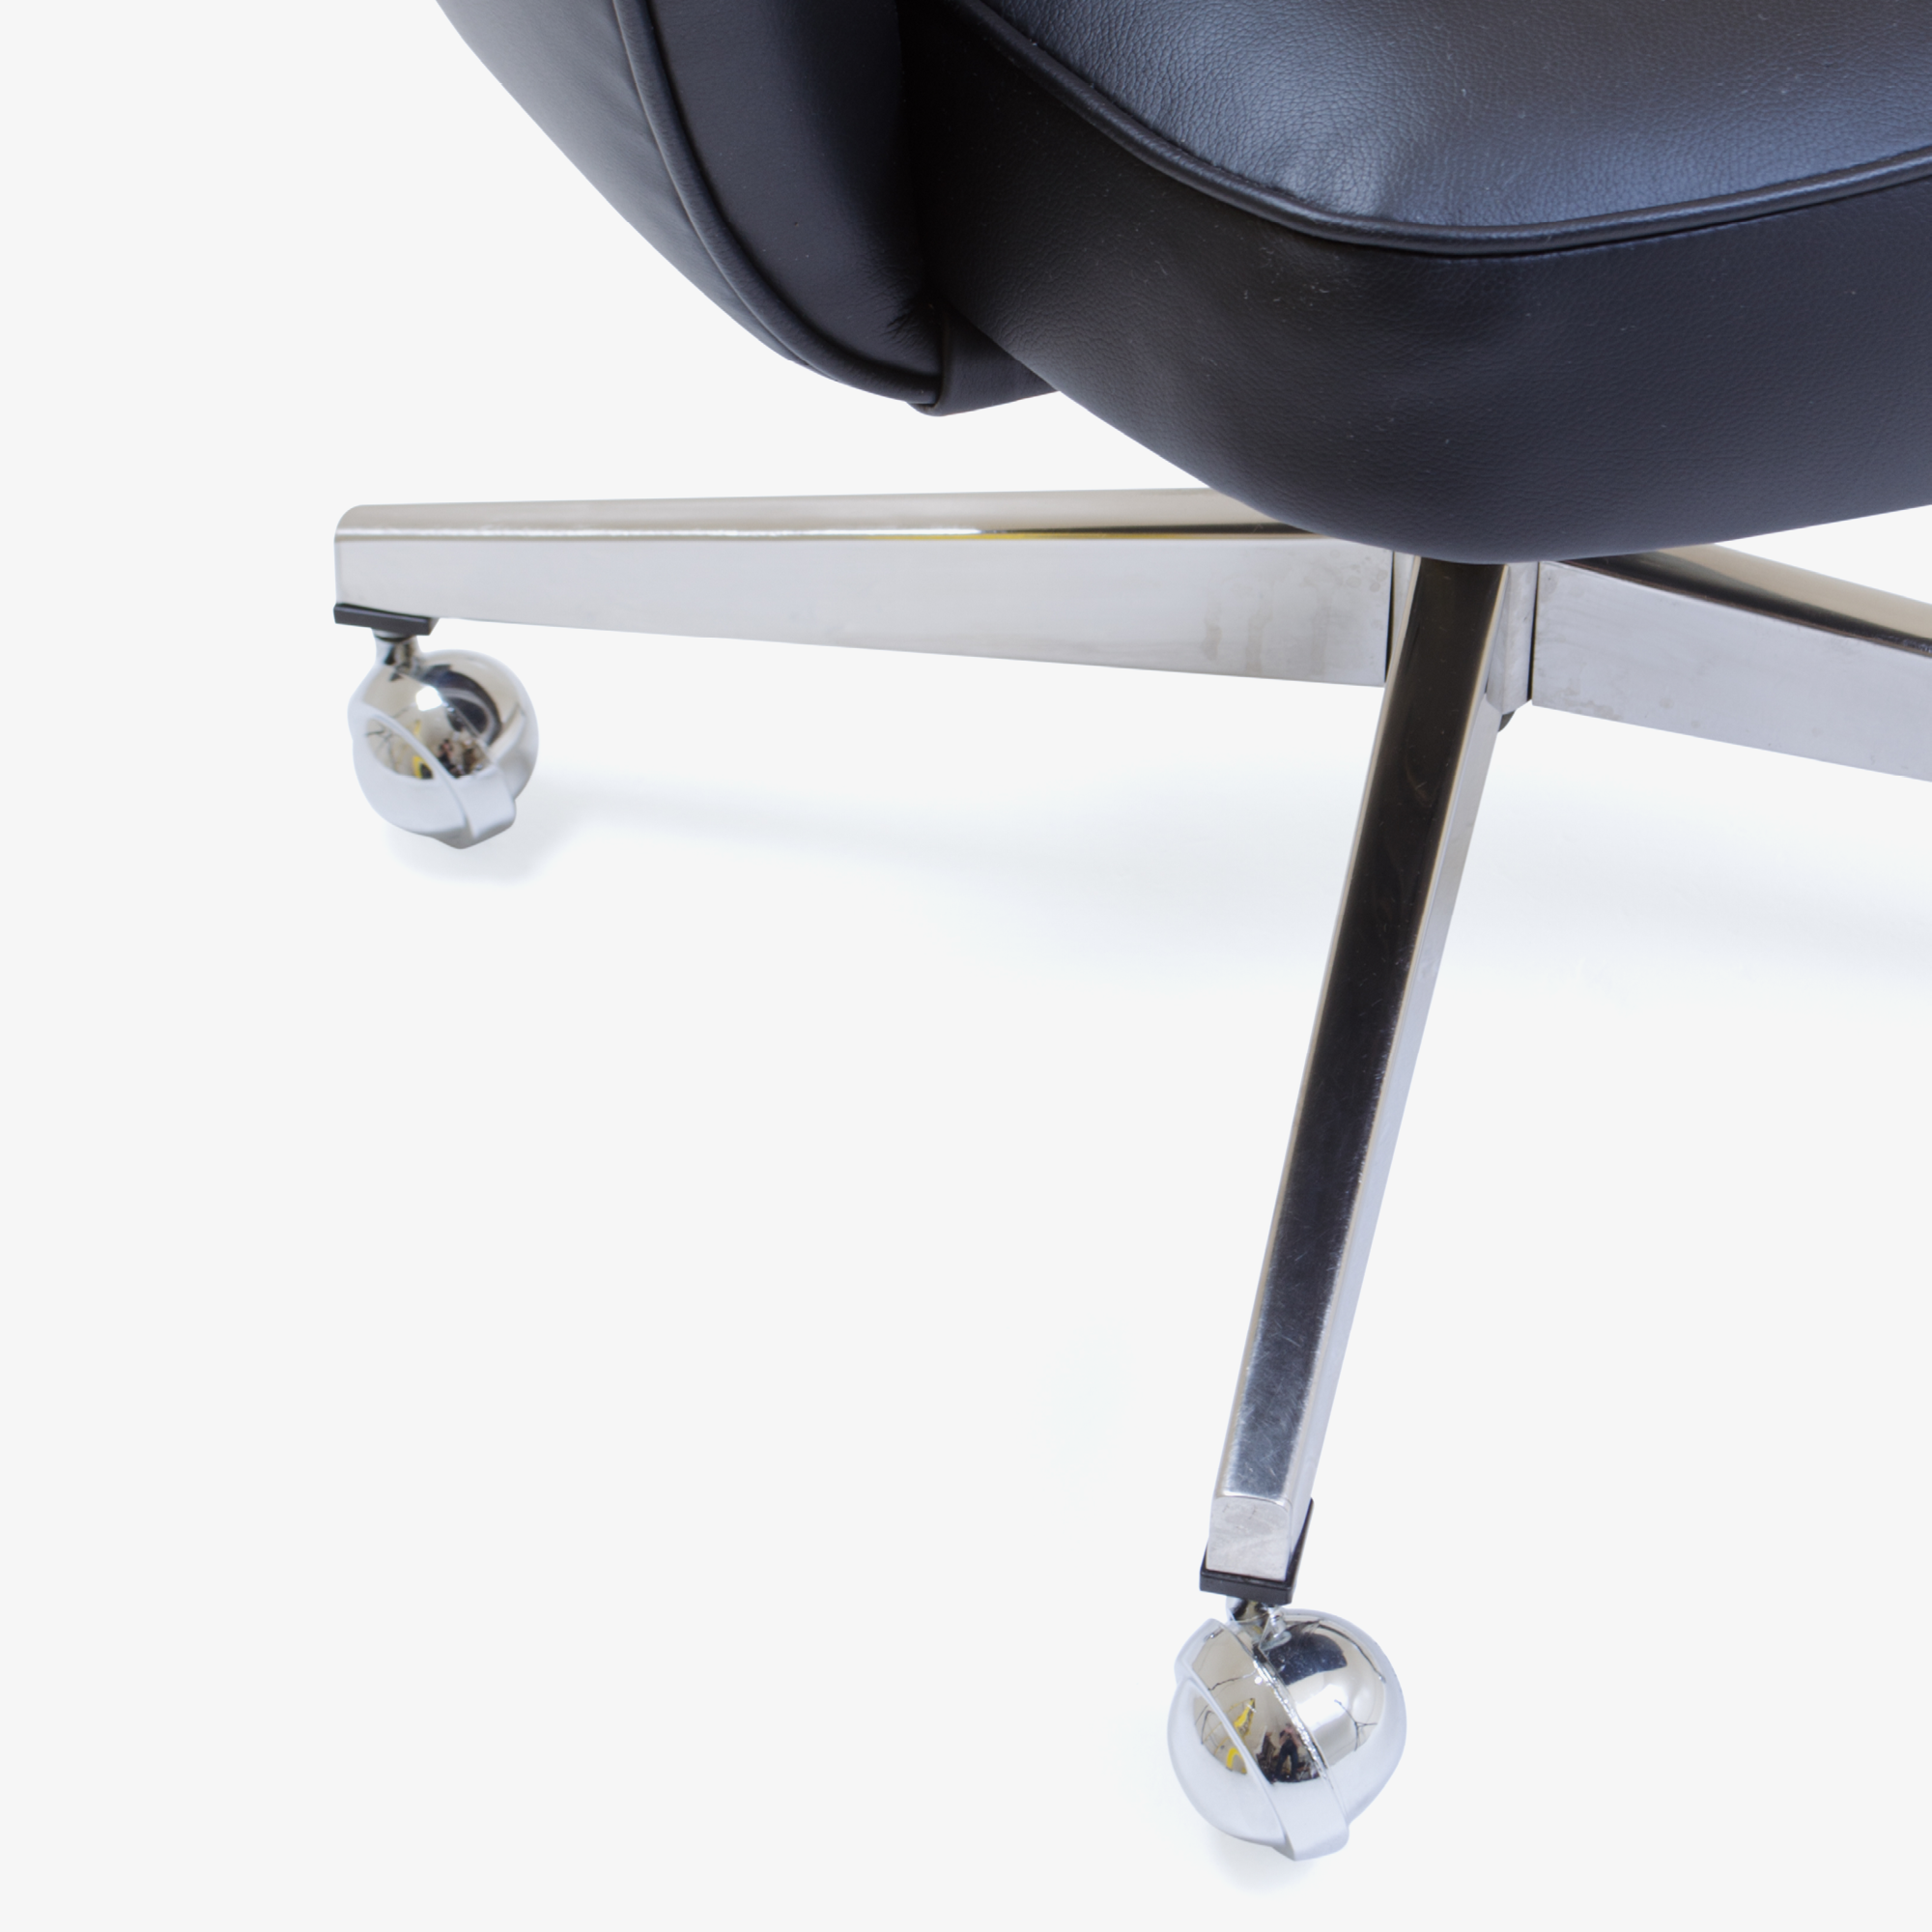 Knoll Saarinen Executive Arm Chair in Leather